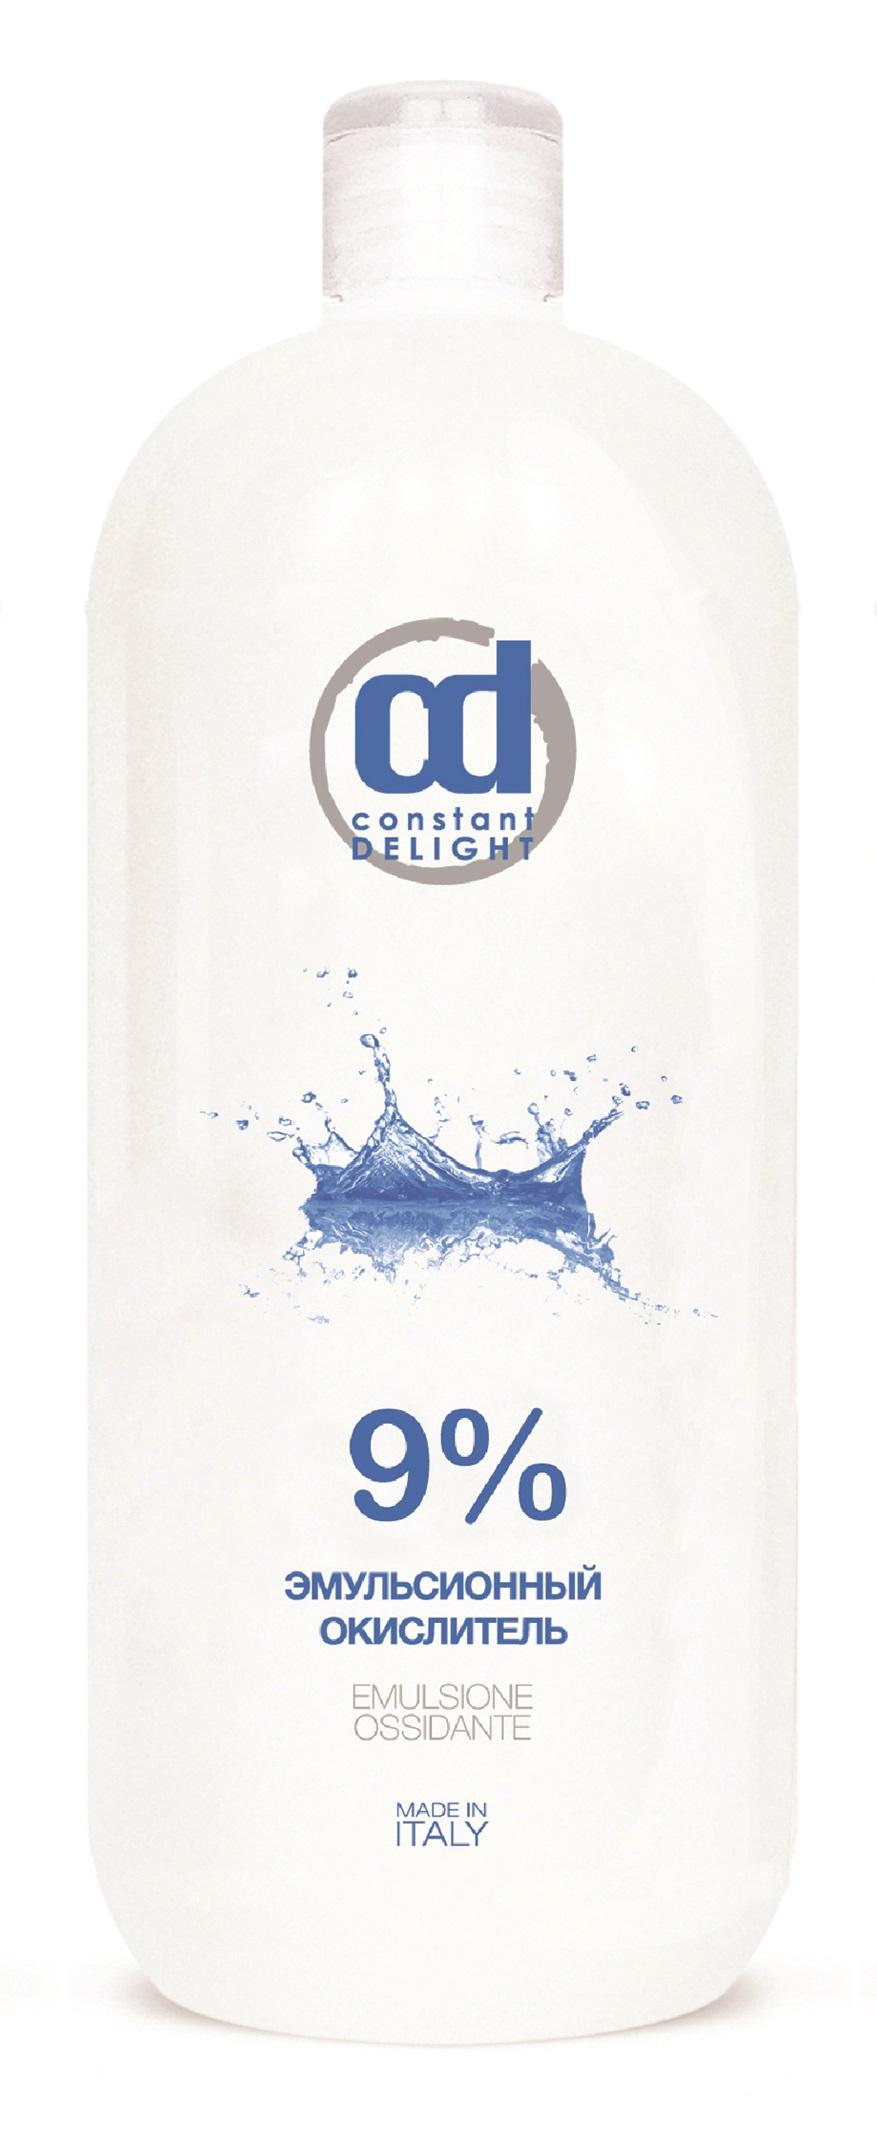 CONSTANT DELIGHT Окислитель эмульсионный 9% белый / Oxigent, 1000 мл